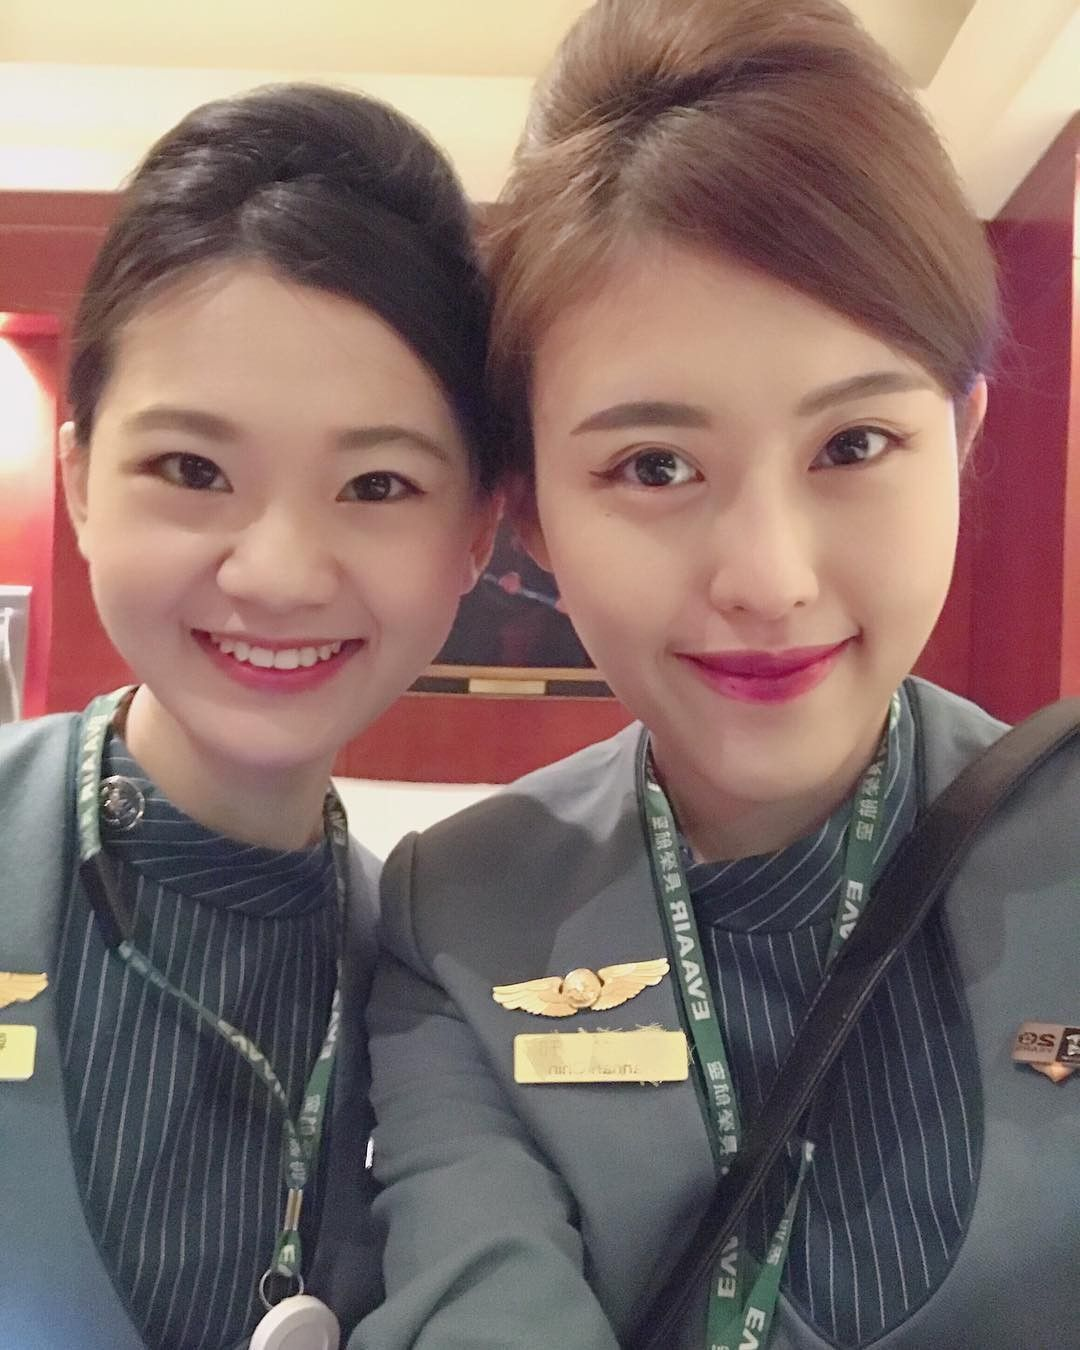 【台湾】エバー航空(長榮航空)客室乗務員 旧制服ver./Eva Air cabin crew 客室乗務員